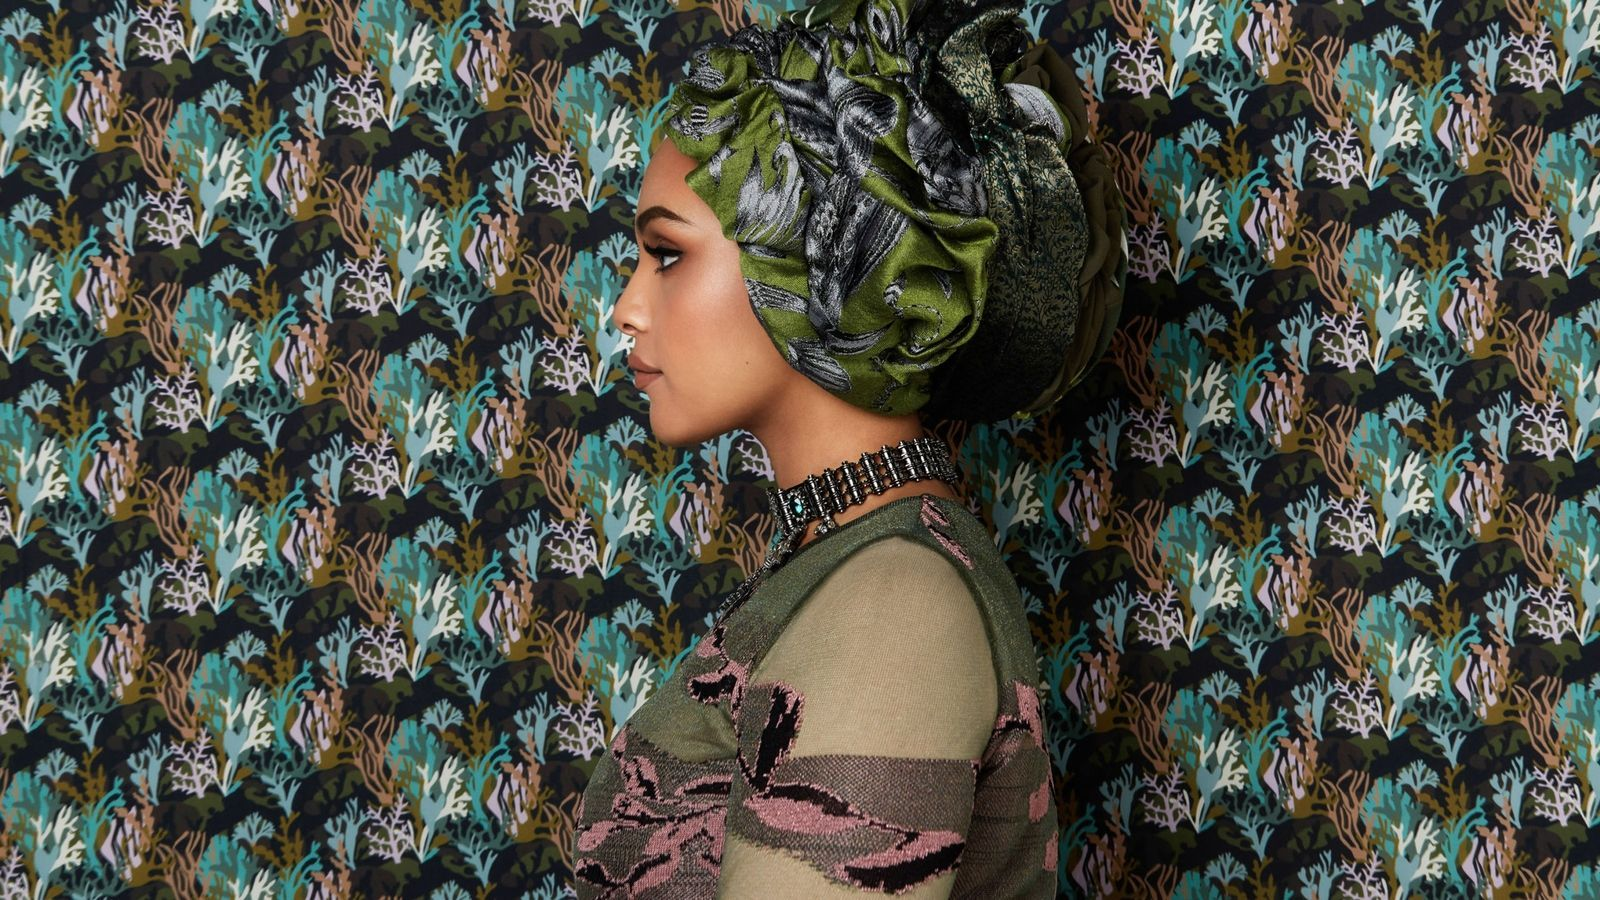 Hijabi Beauty Influencers Profile and Photos - Muslim Beauty Bloggers